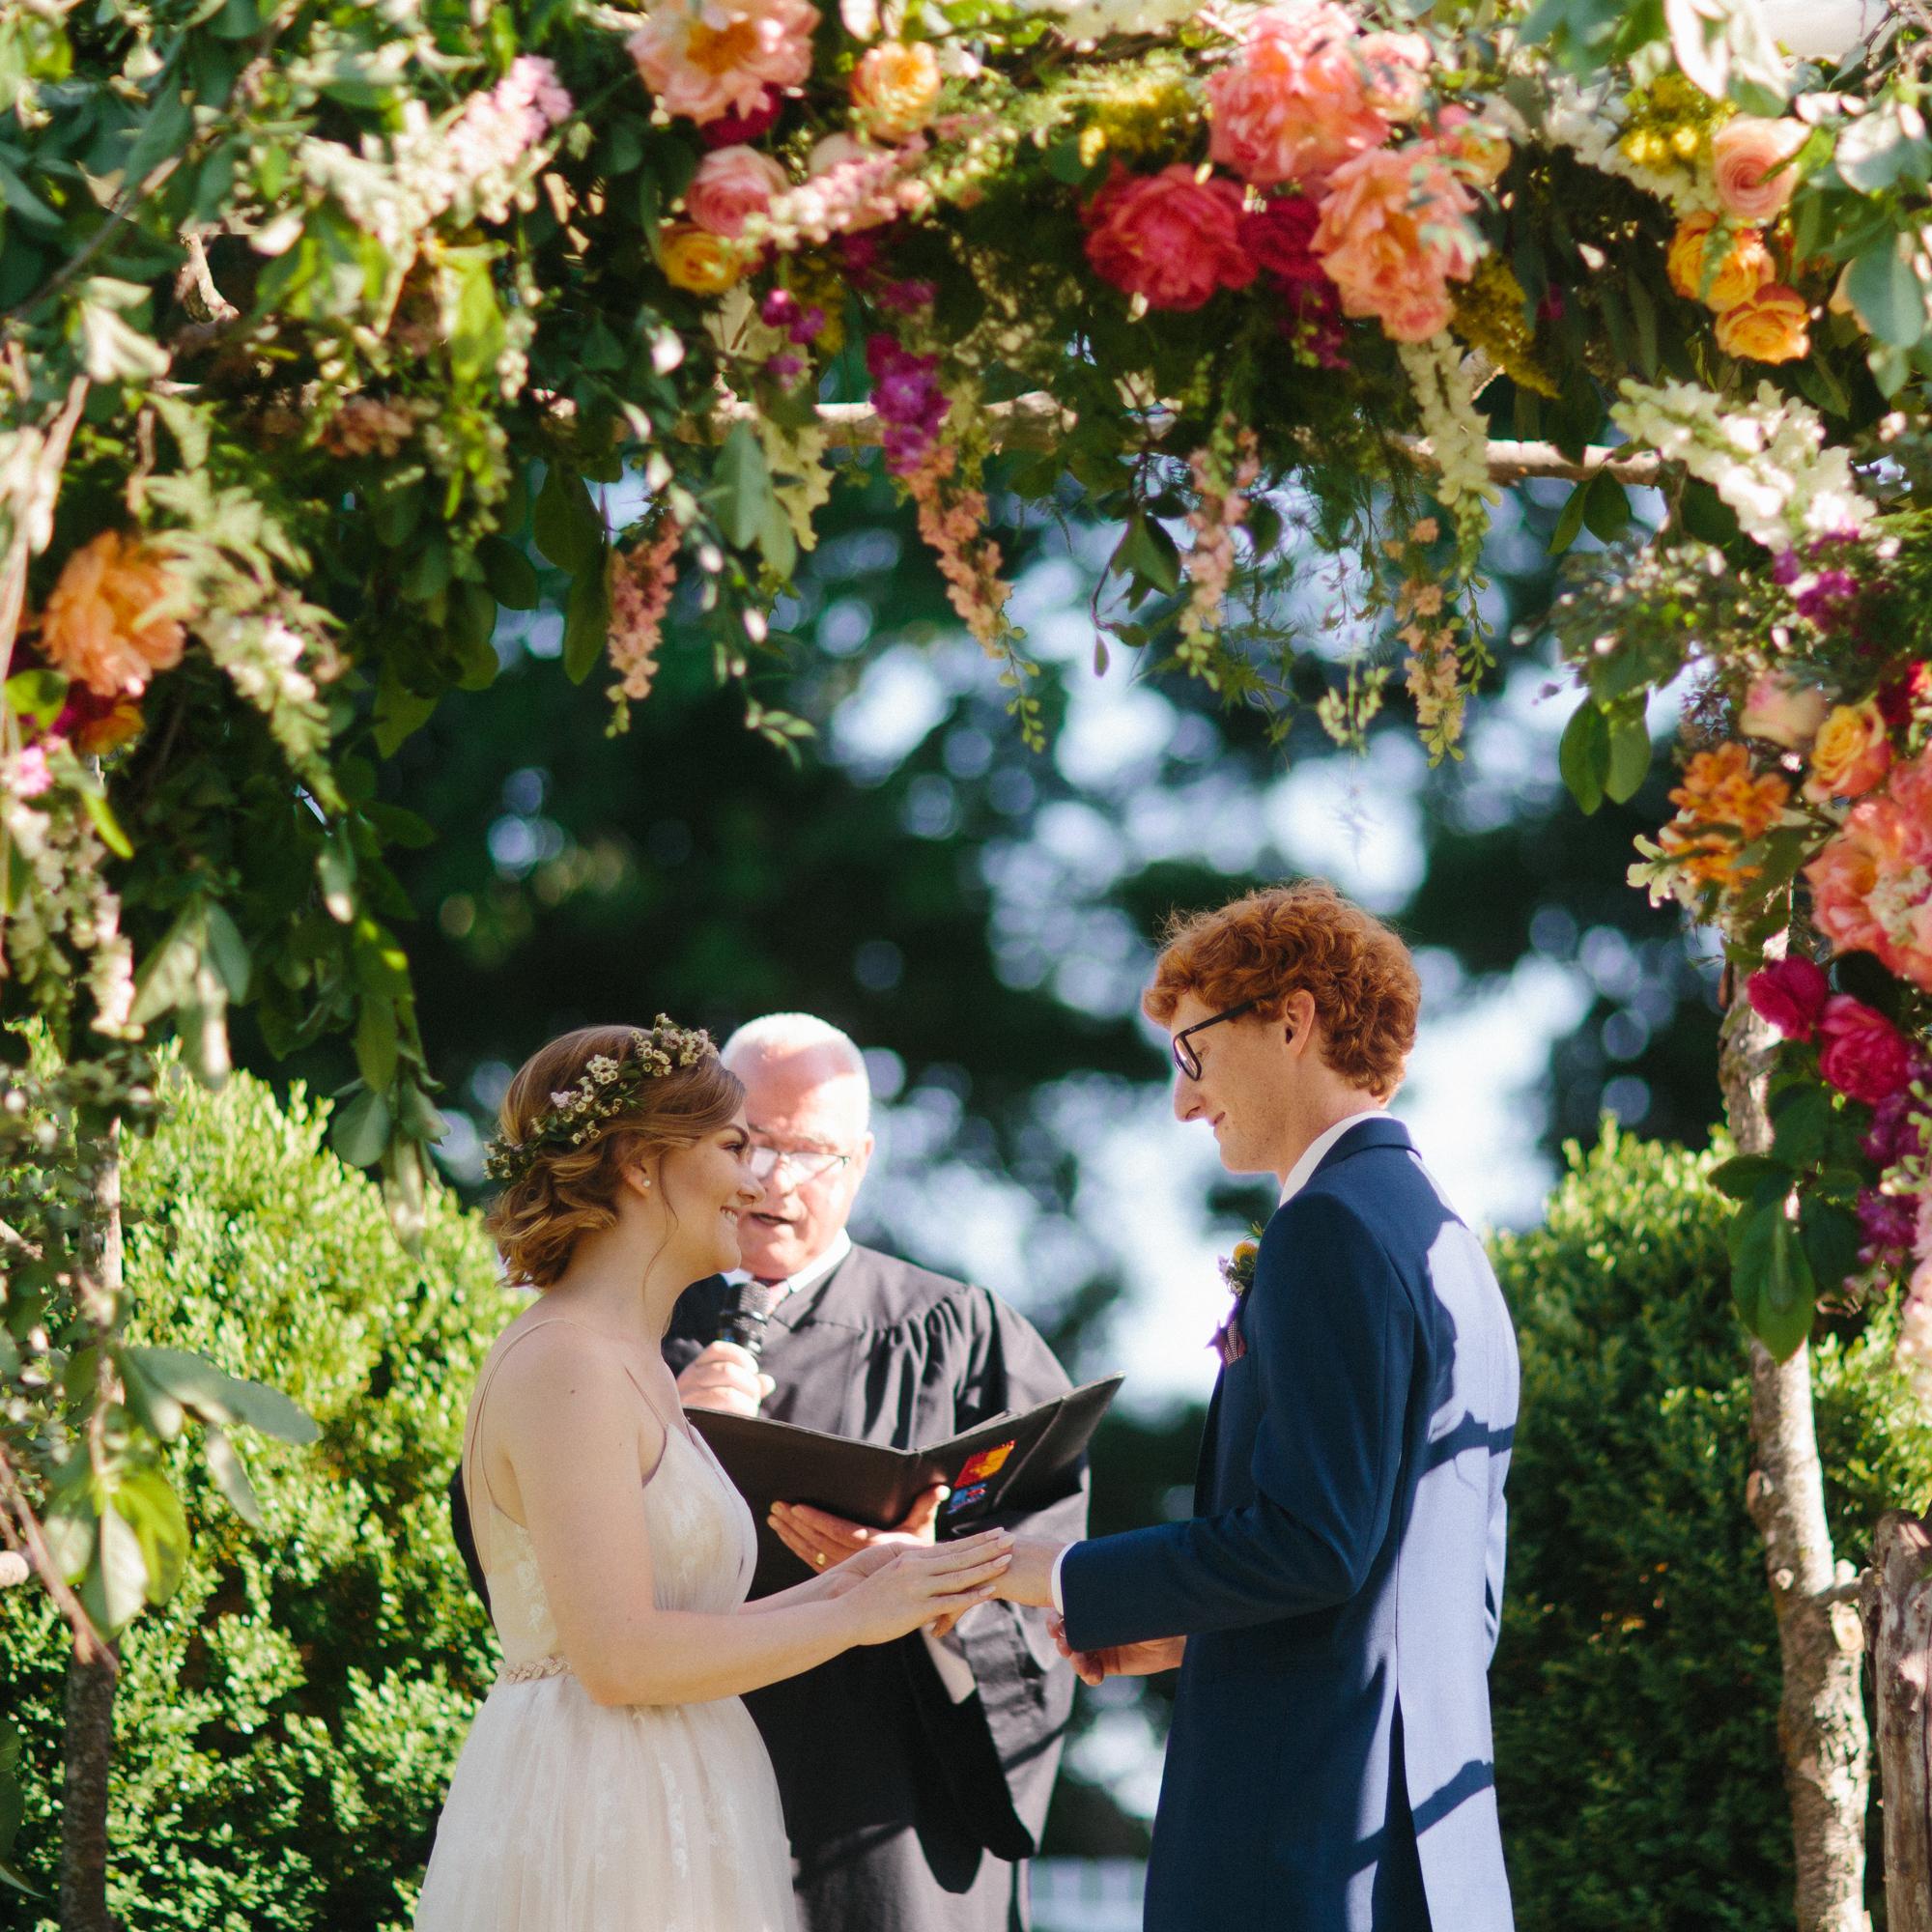 alec_vanderboom_kansas_city_mo_wedding_photos-0045.jpg